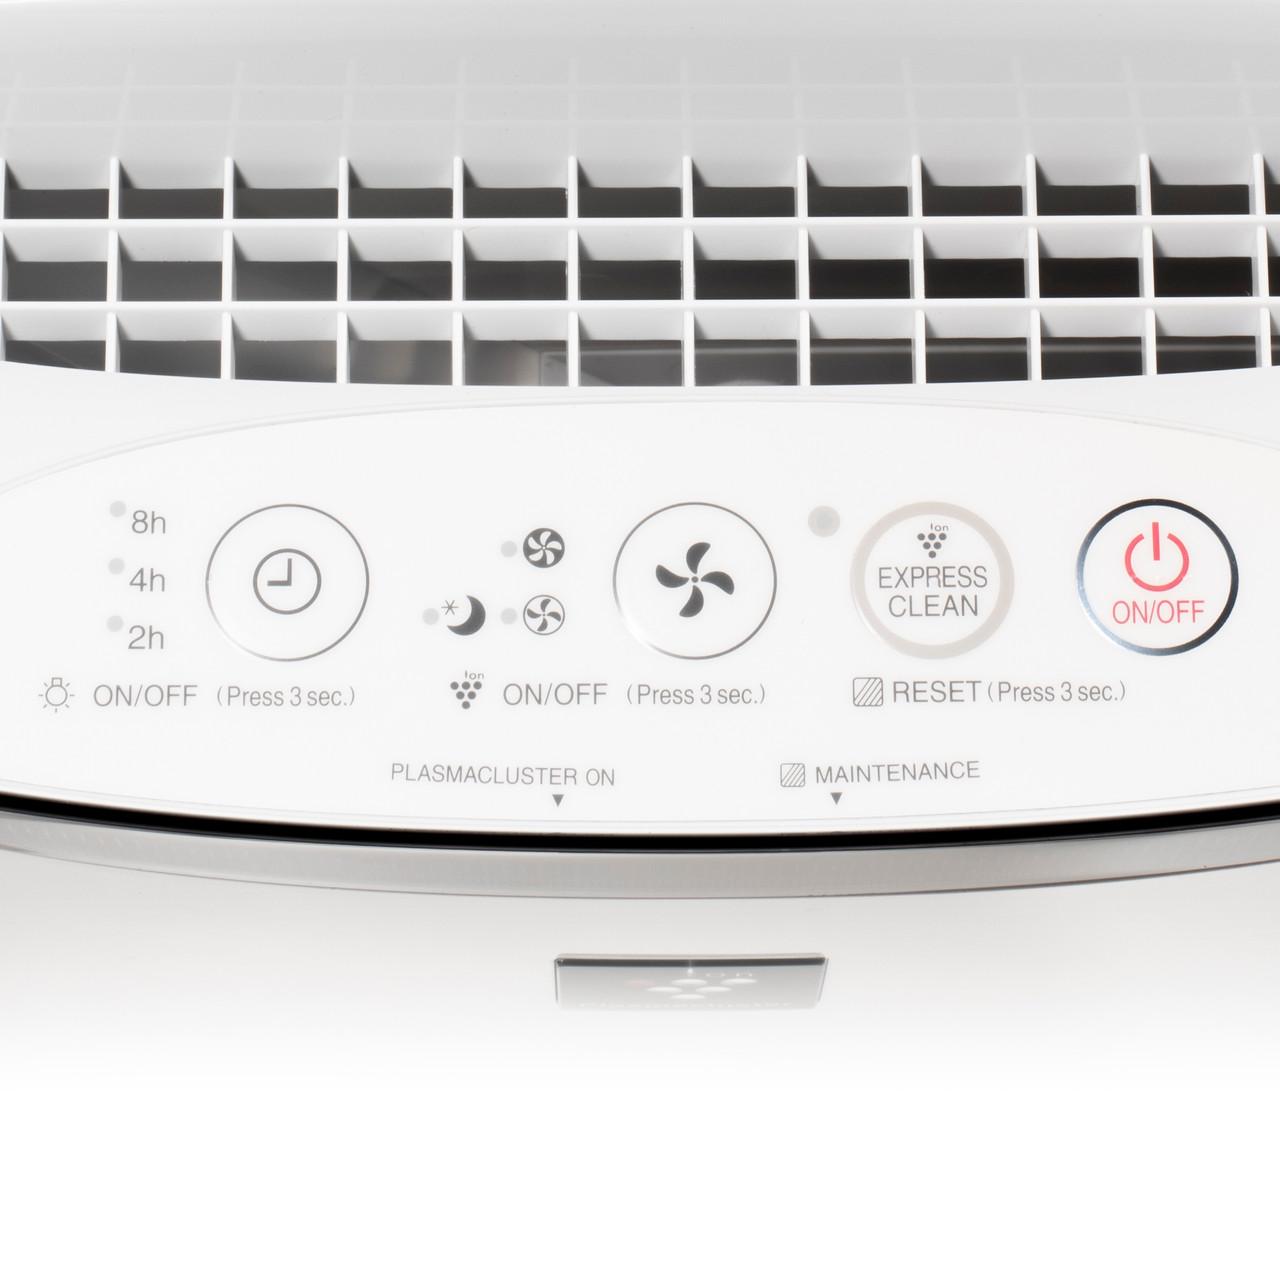 Sharp True HEPA Air Purifier for Medium-Sized Rooms (FPK50UW) – control panel top view